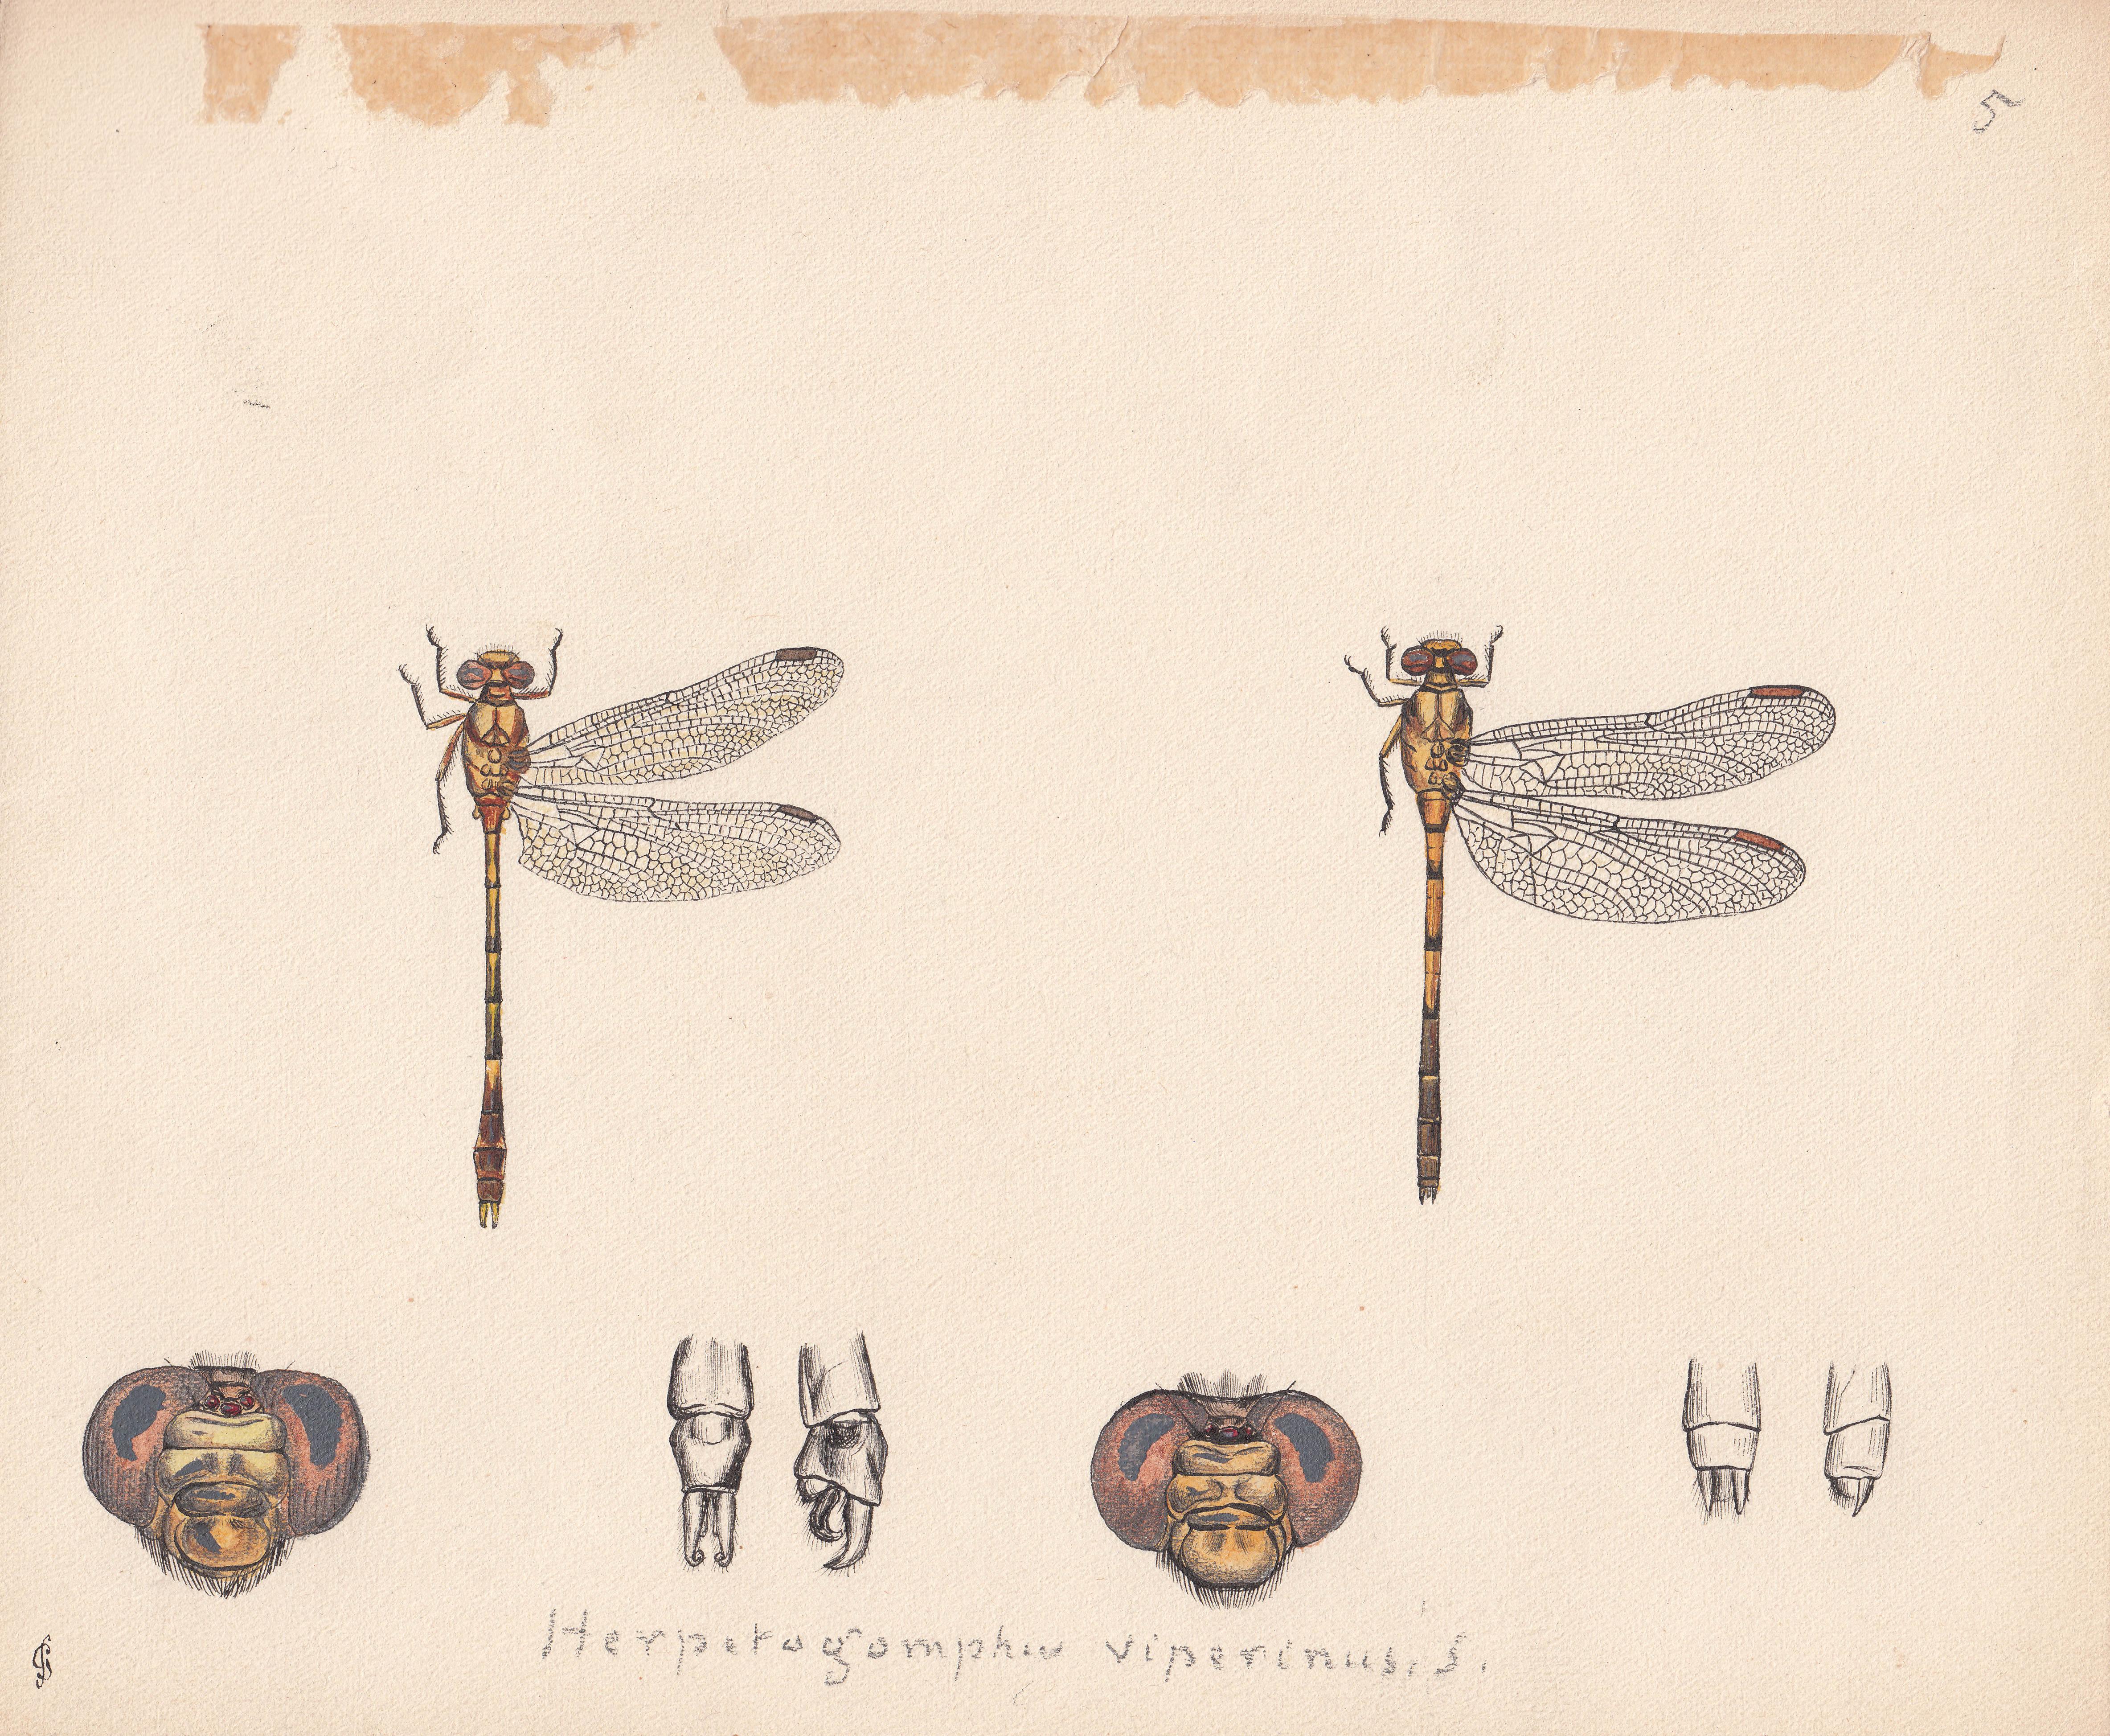 Herpetogomphus viperinus.jpg